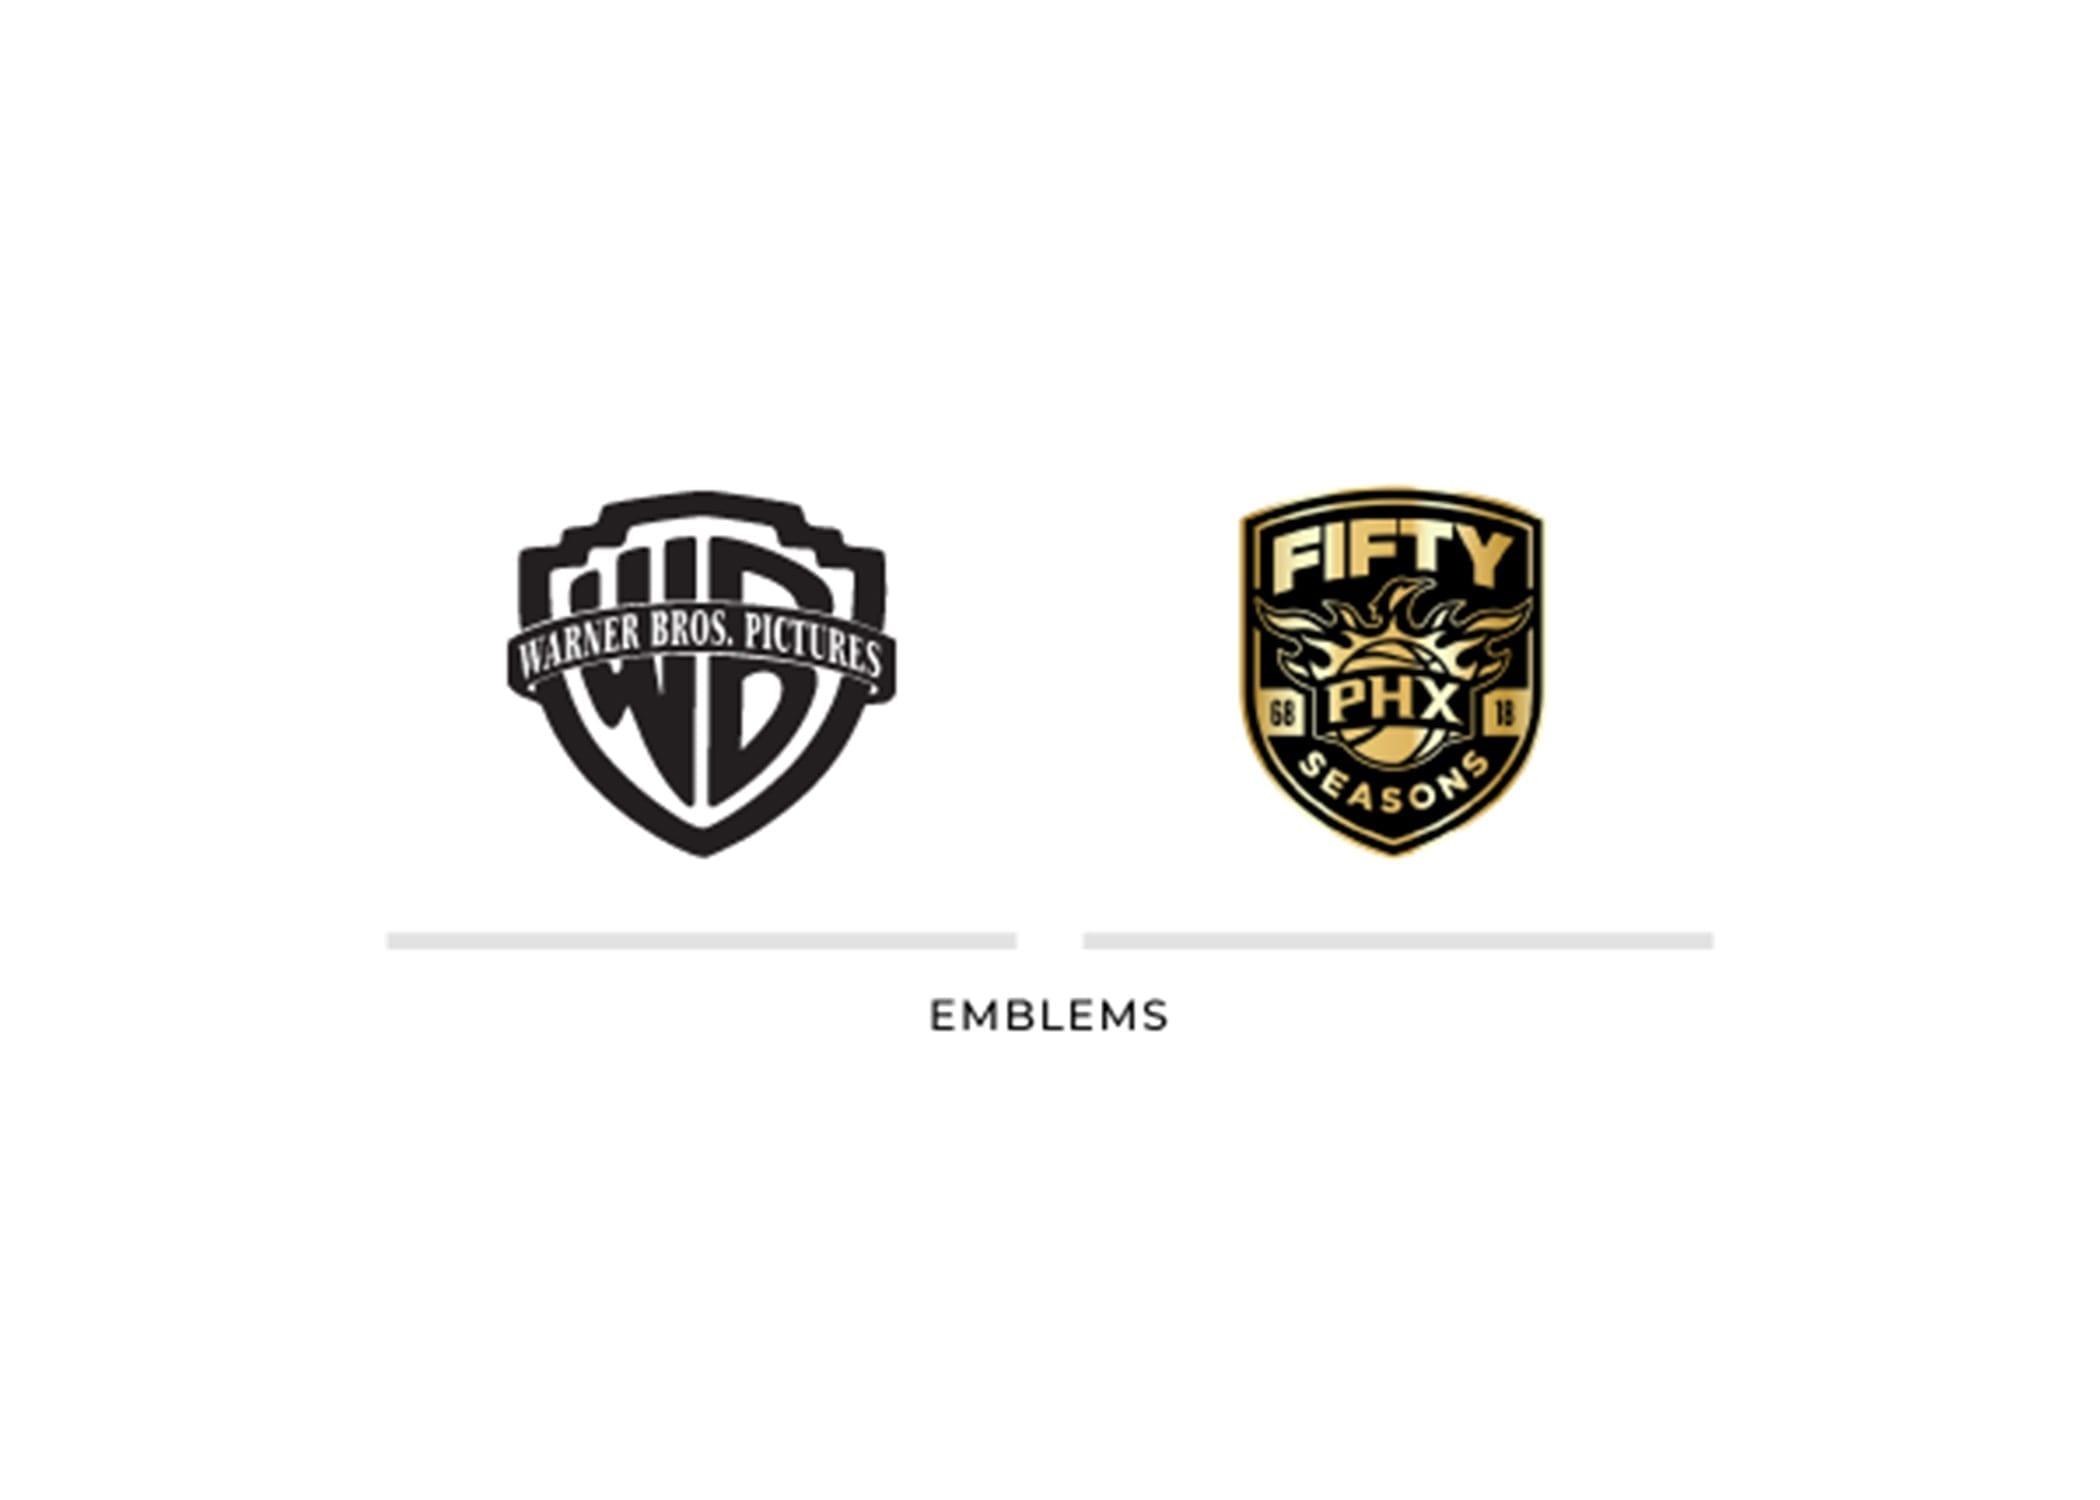 emblem logo inspiration examples